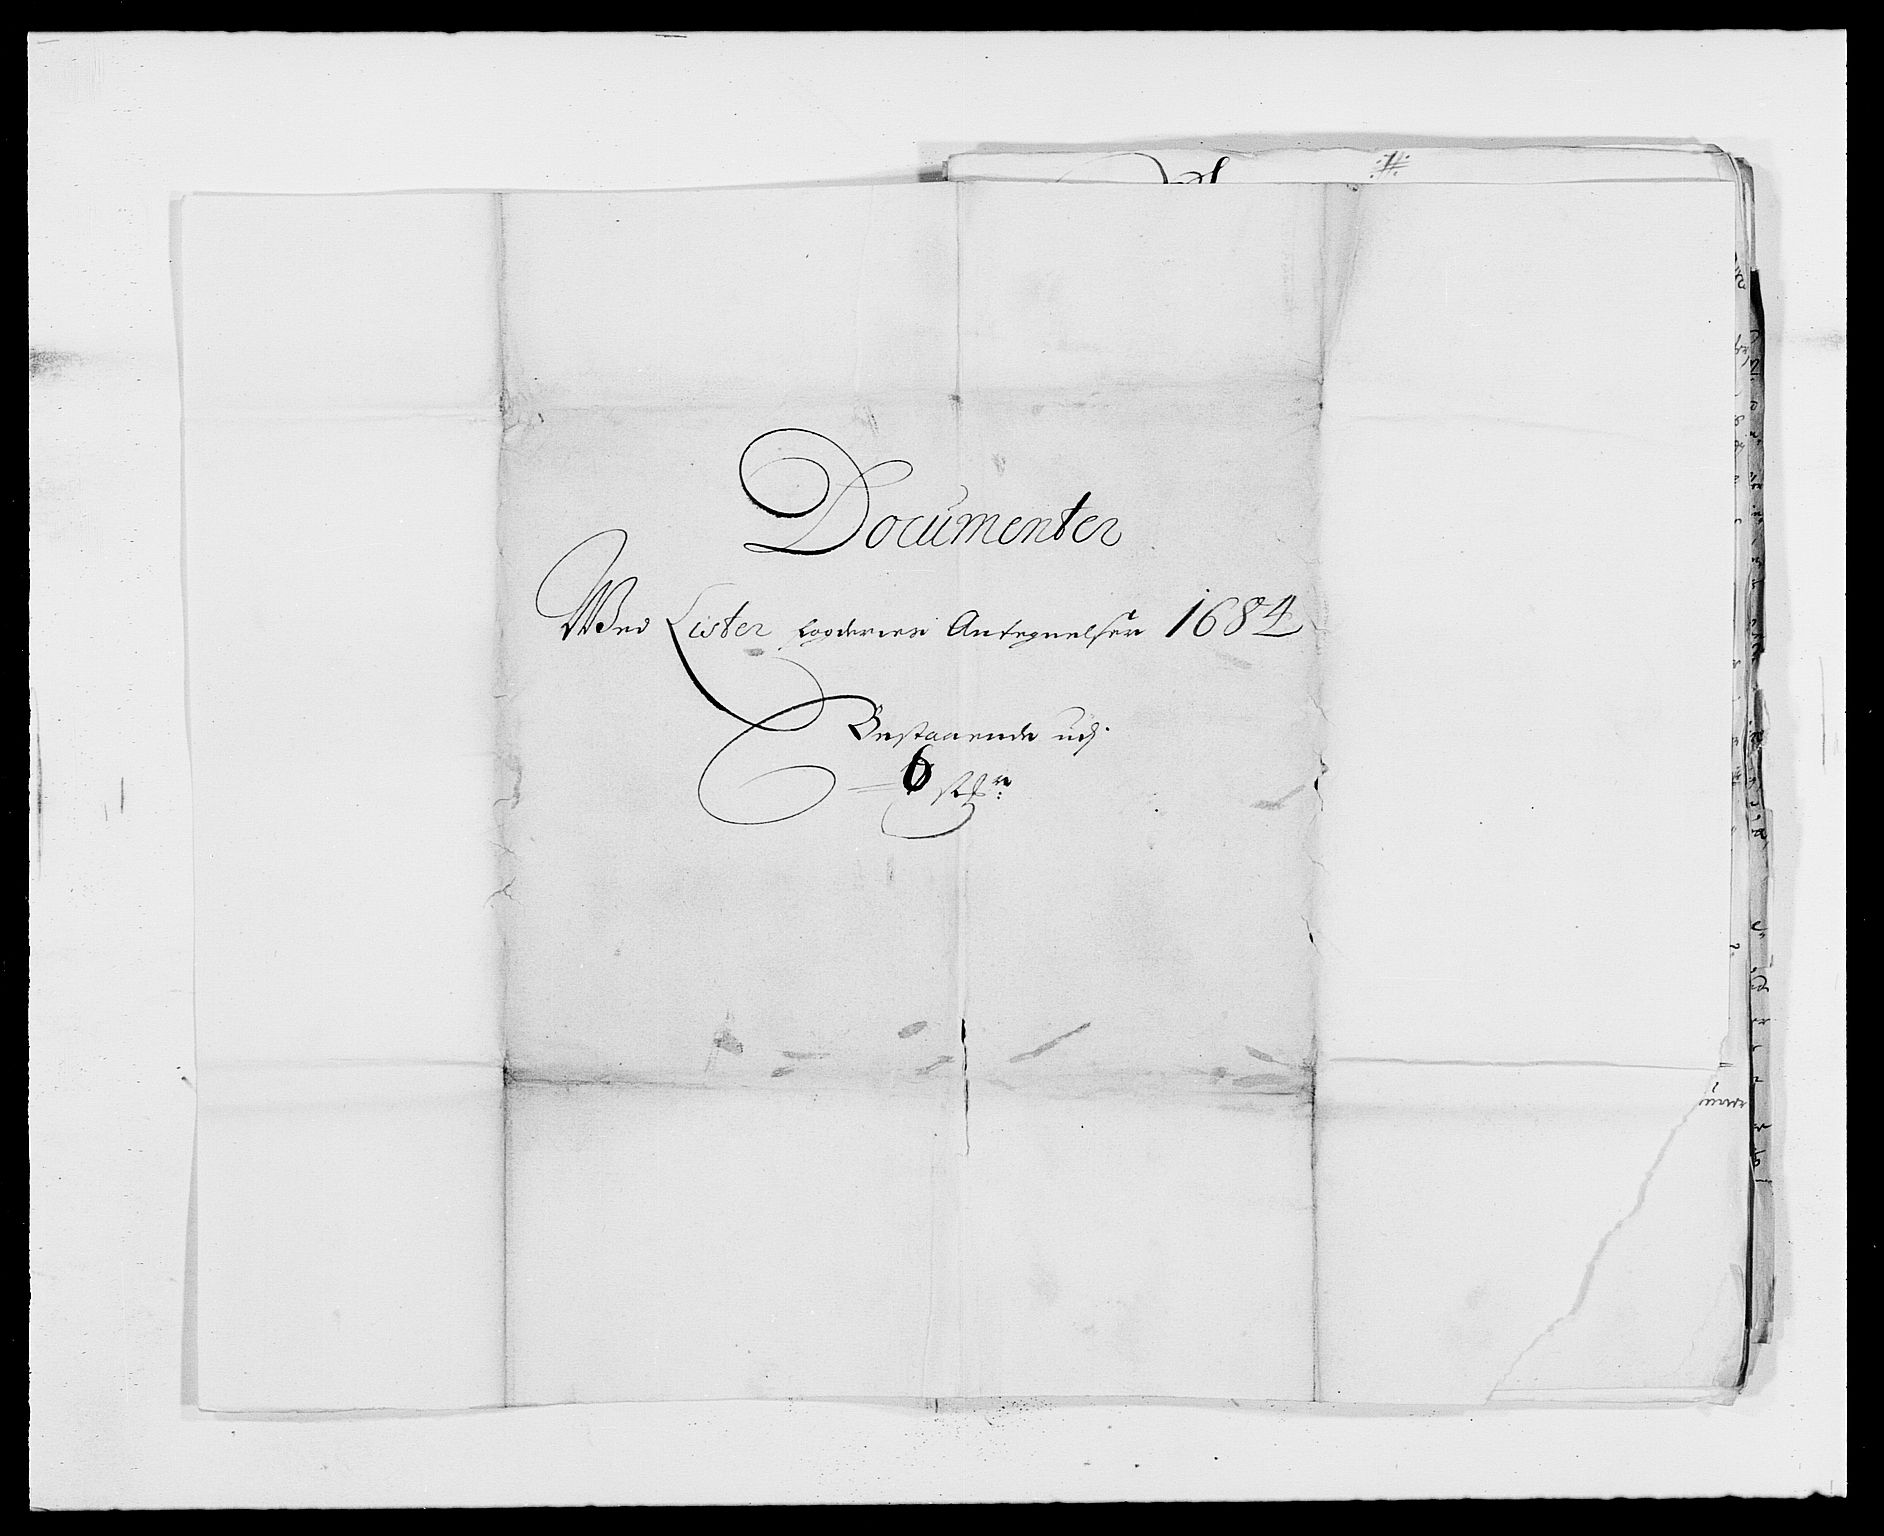 RA, Rentekammeret inntil 1814, Reviderte regnskaper, Fogderegnskap, R41/L2533: Fogderegnskap Lista, 1684-1685, s. 241